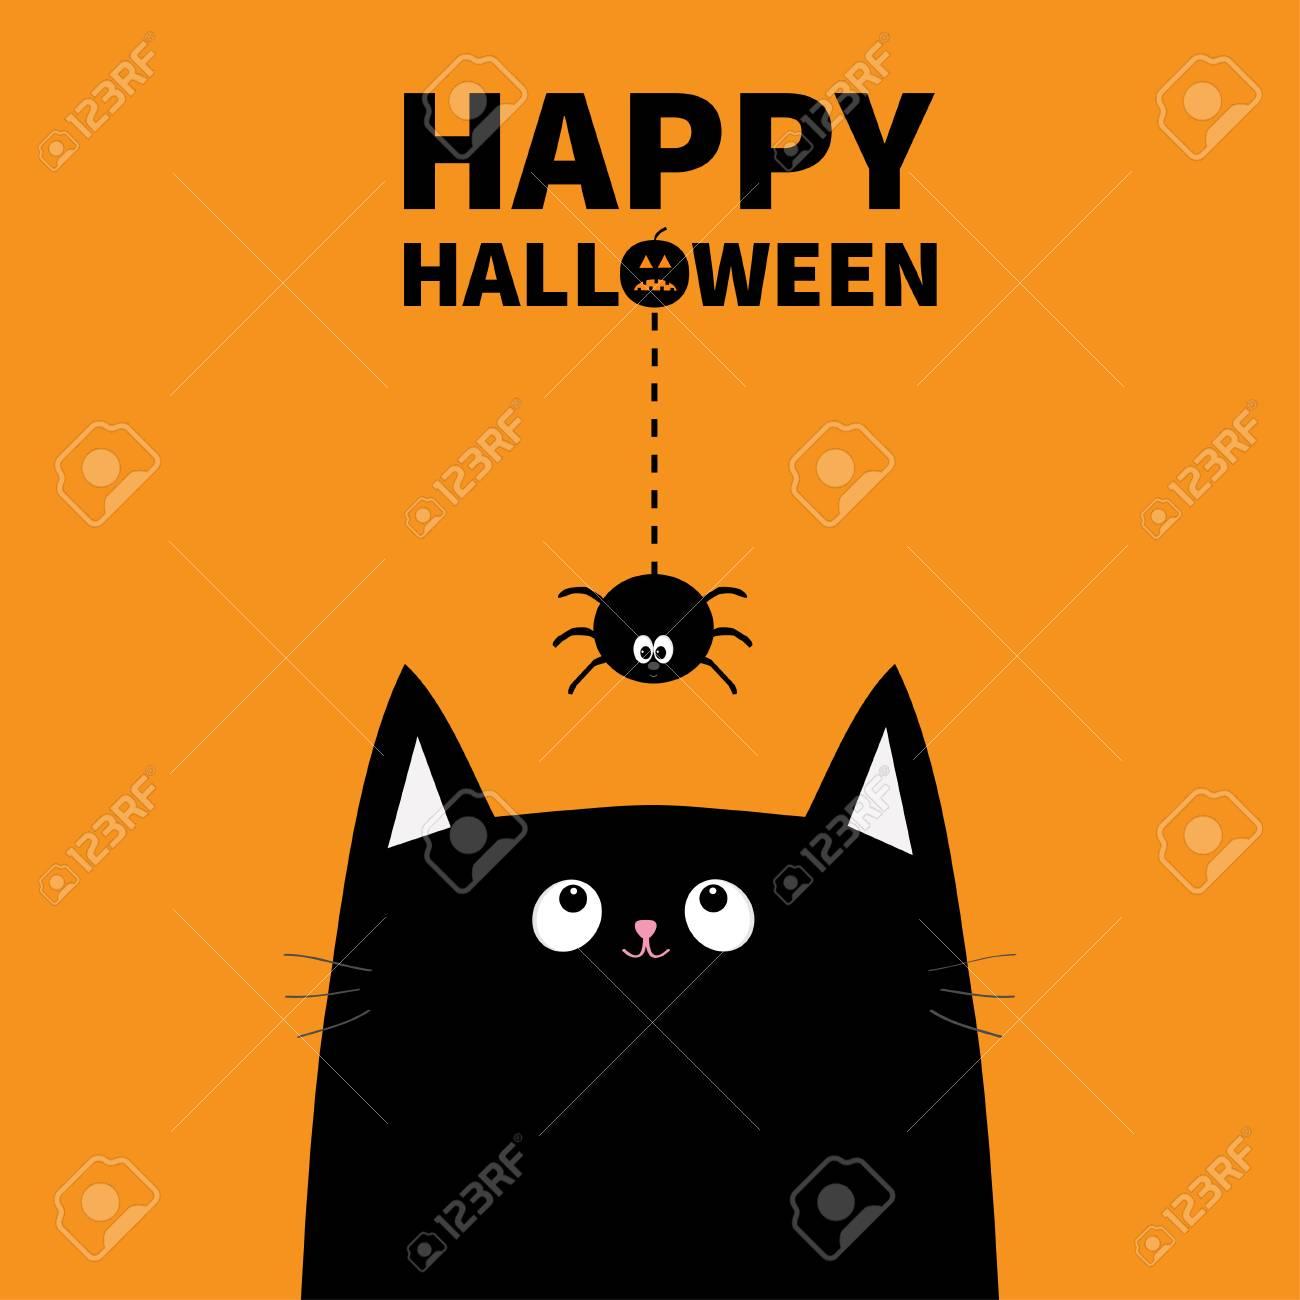 Happy Halloween Pumpkin Text Black Cat Face Head Silhouette